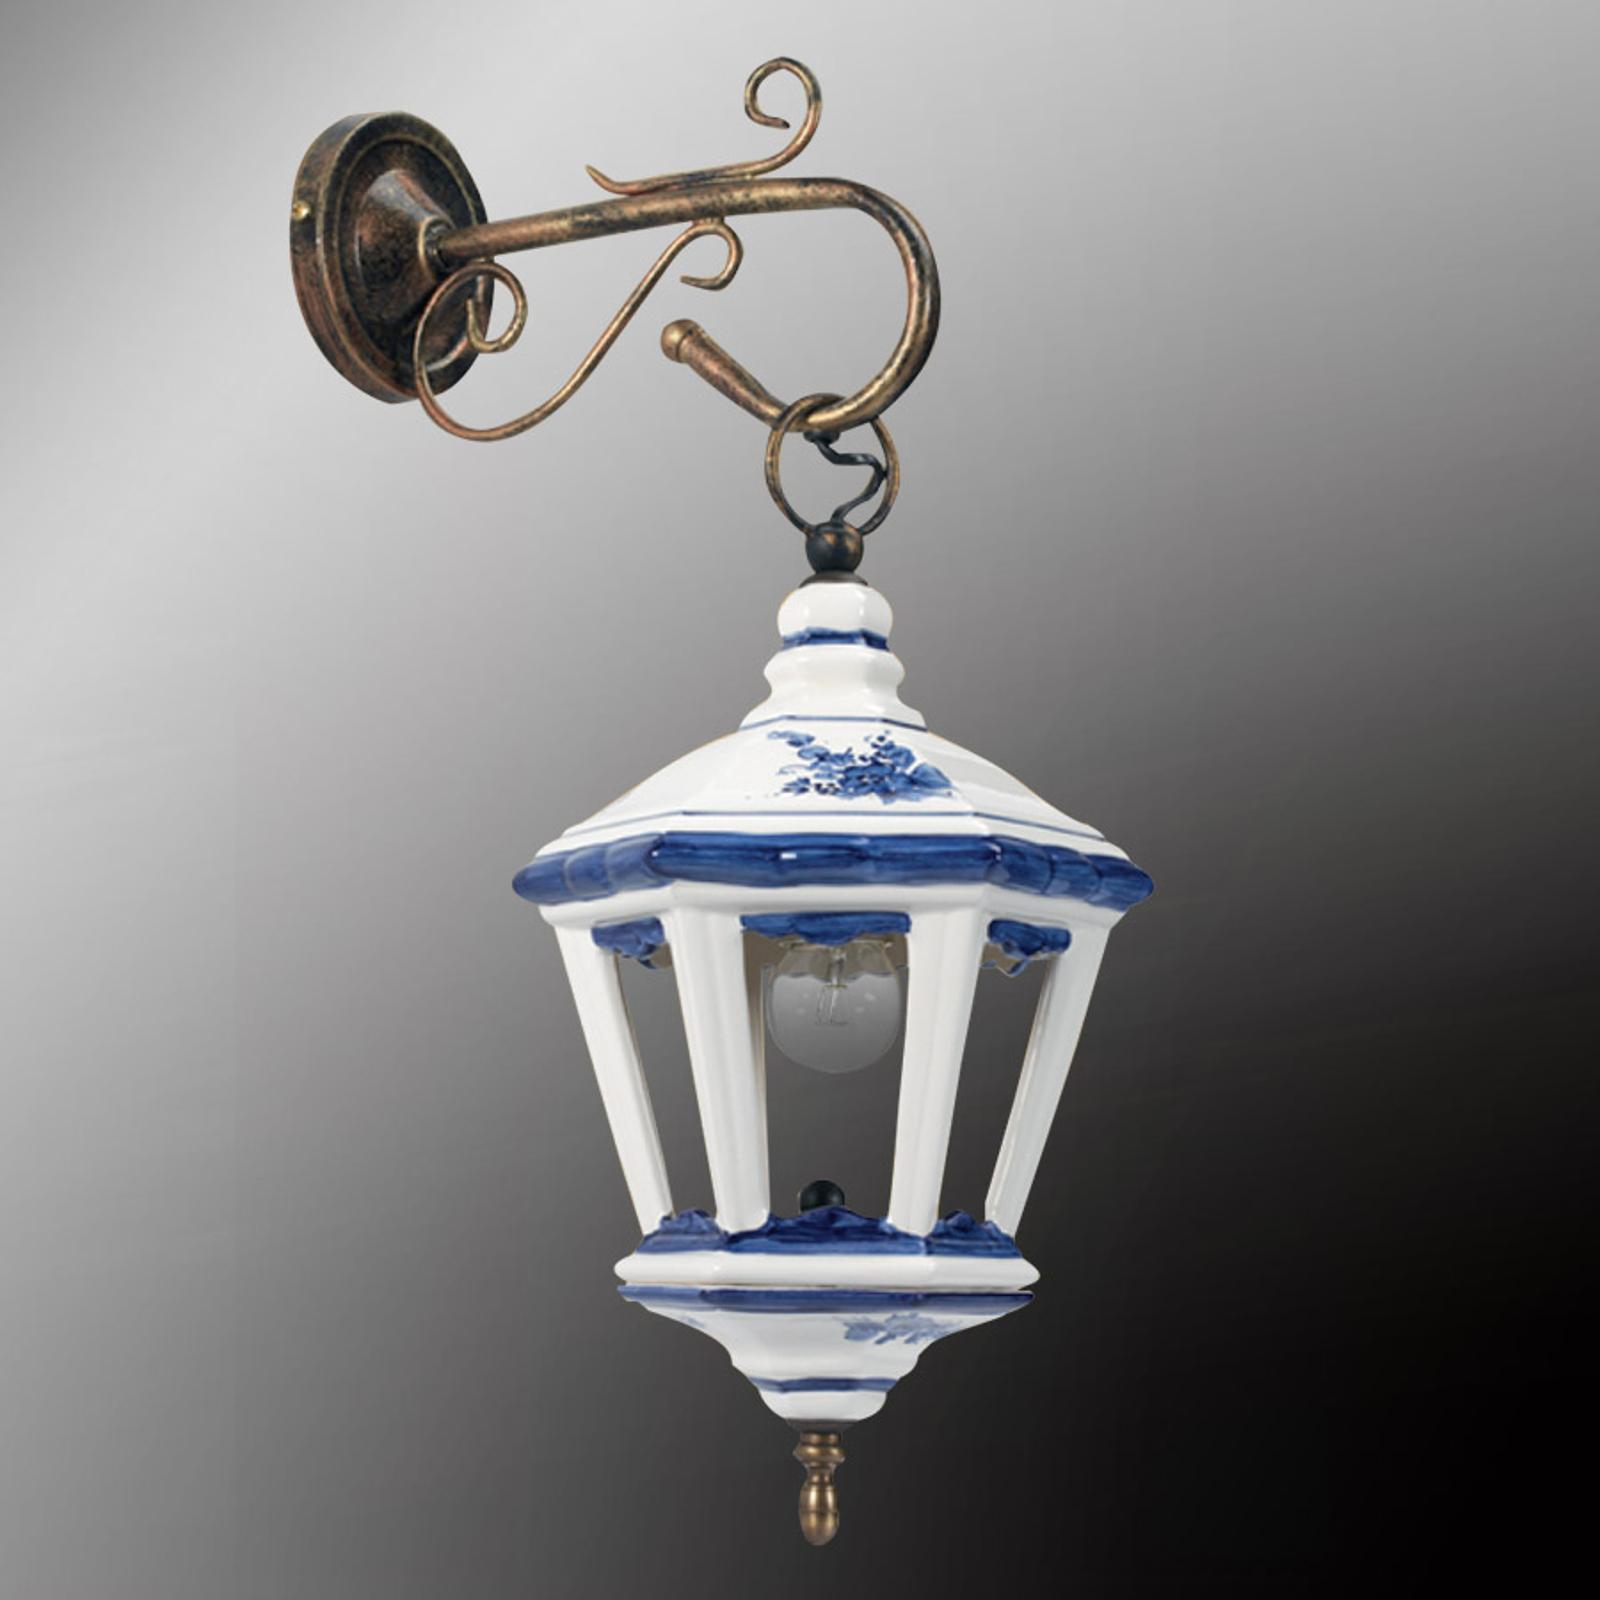 Nástenné svietidlo Viola s lucernou z keramiky_3046208_1